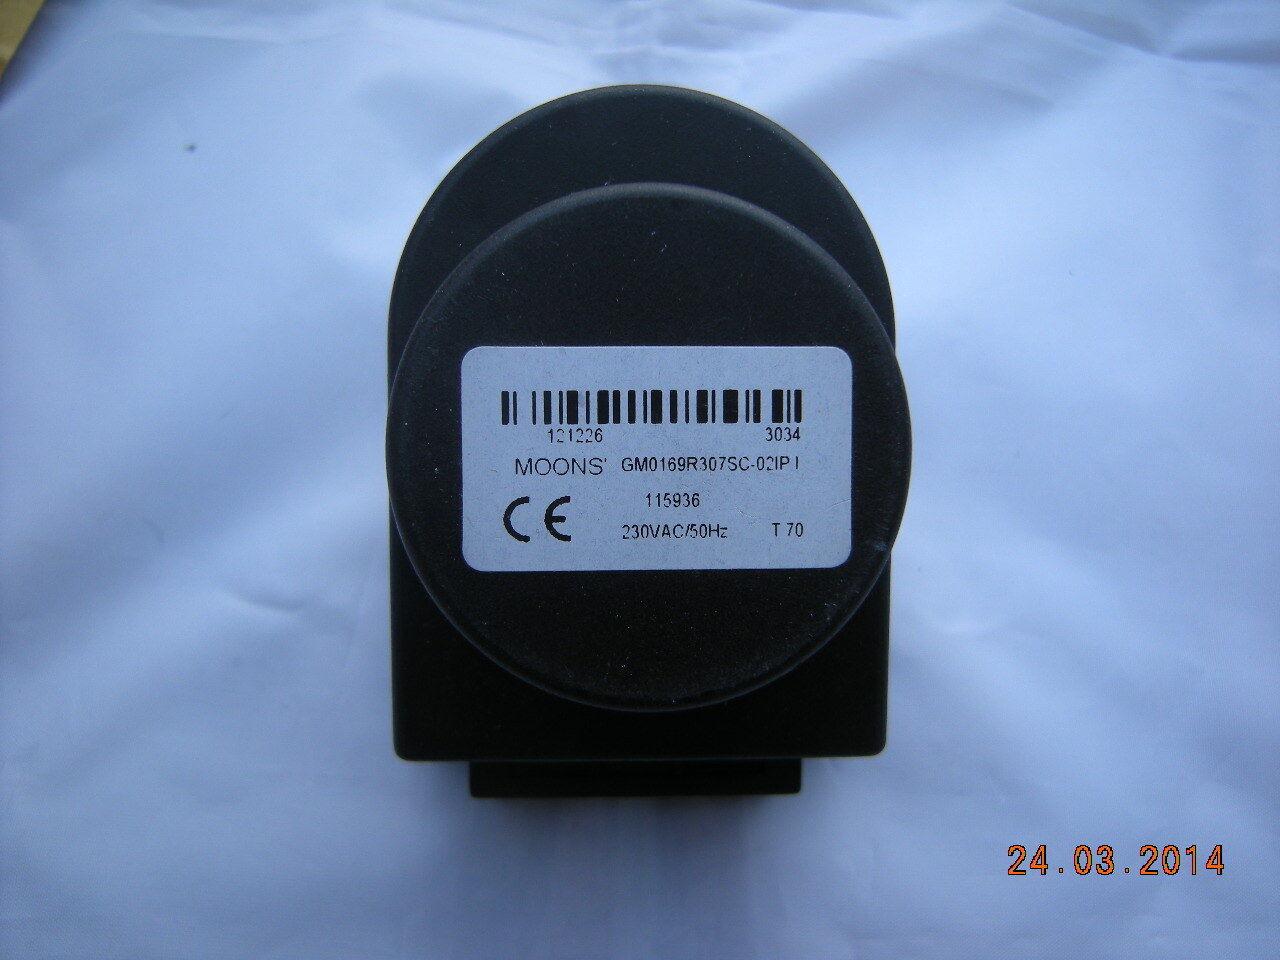 Glowworm Betacom 28a & 30c Diverter Valve Actuator Motor 0020061621 ...